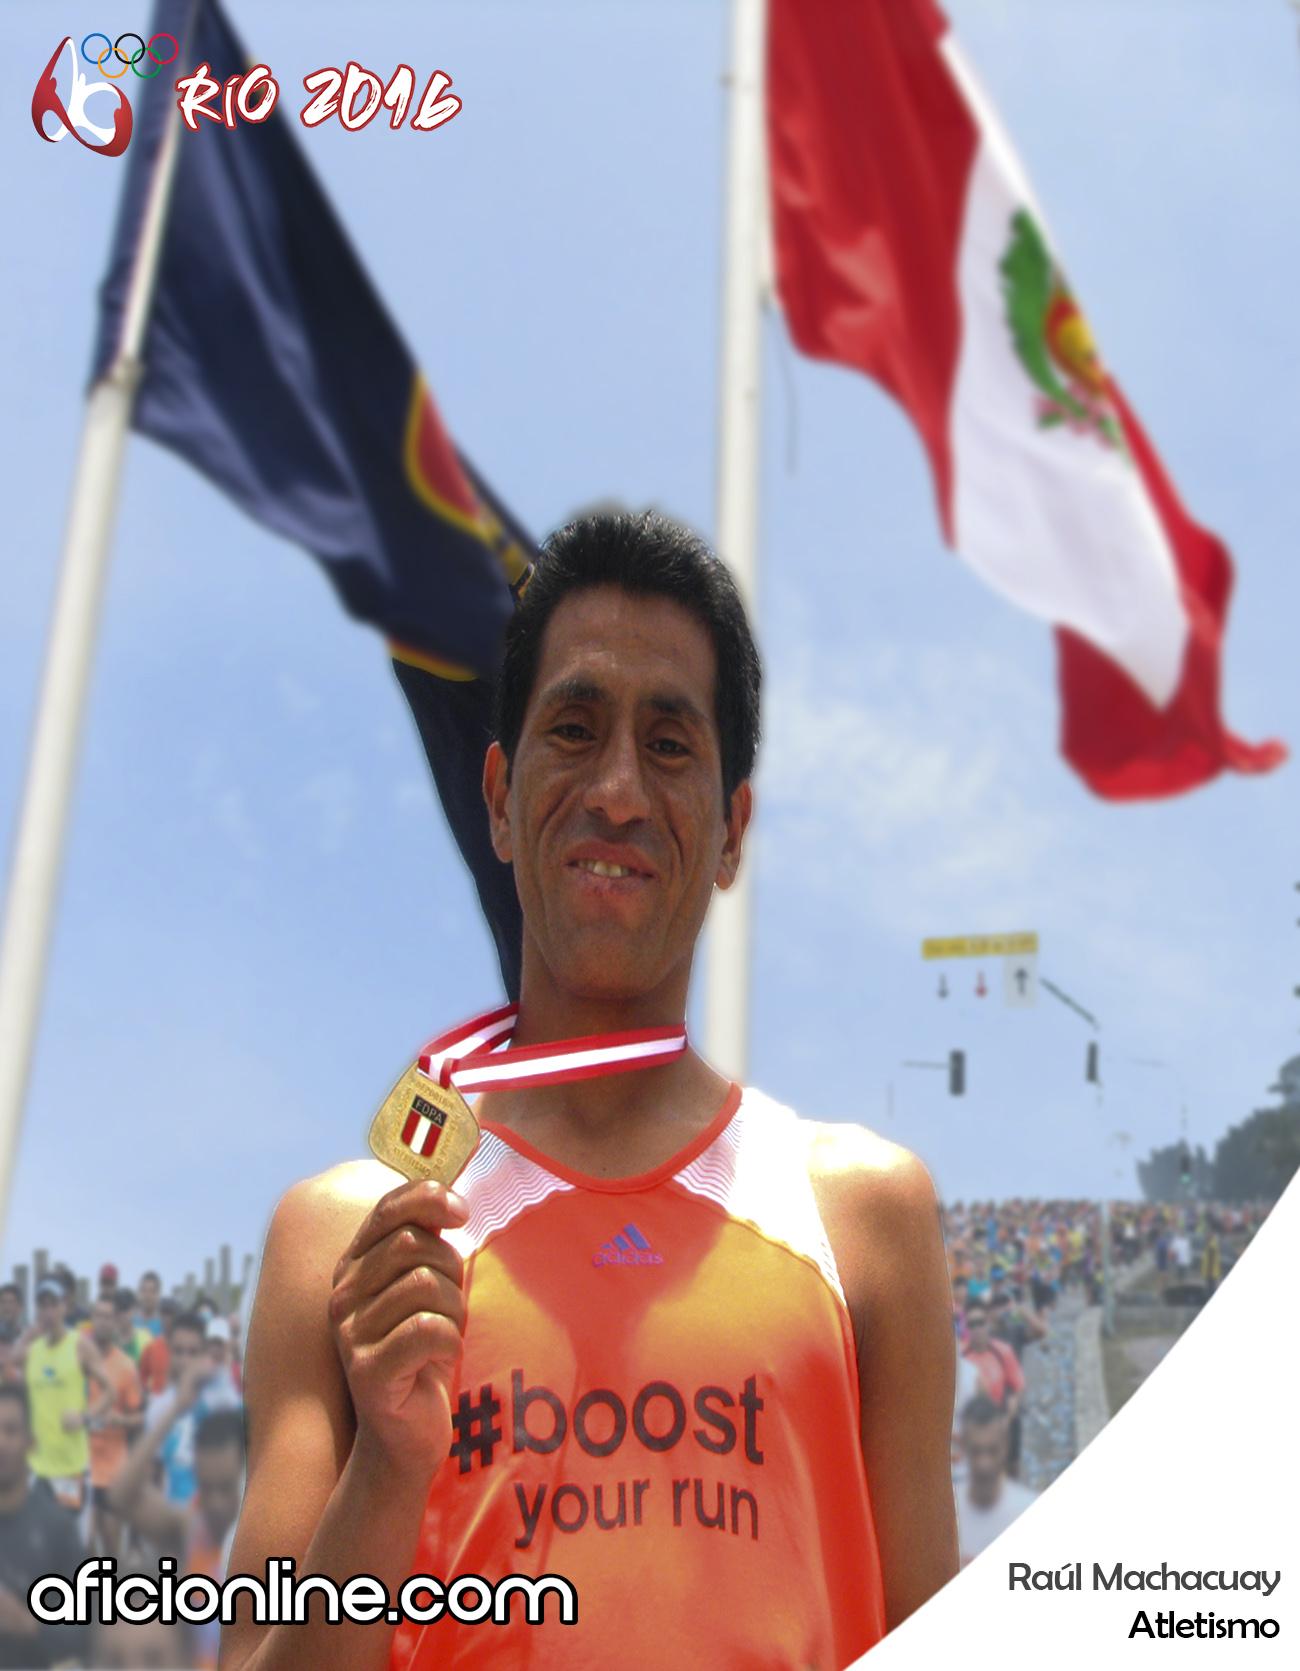 Raul Machacuay Rio 2016 2